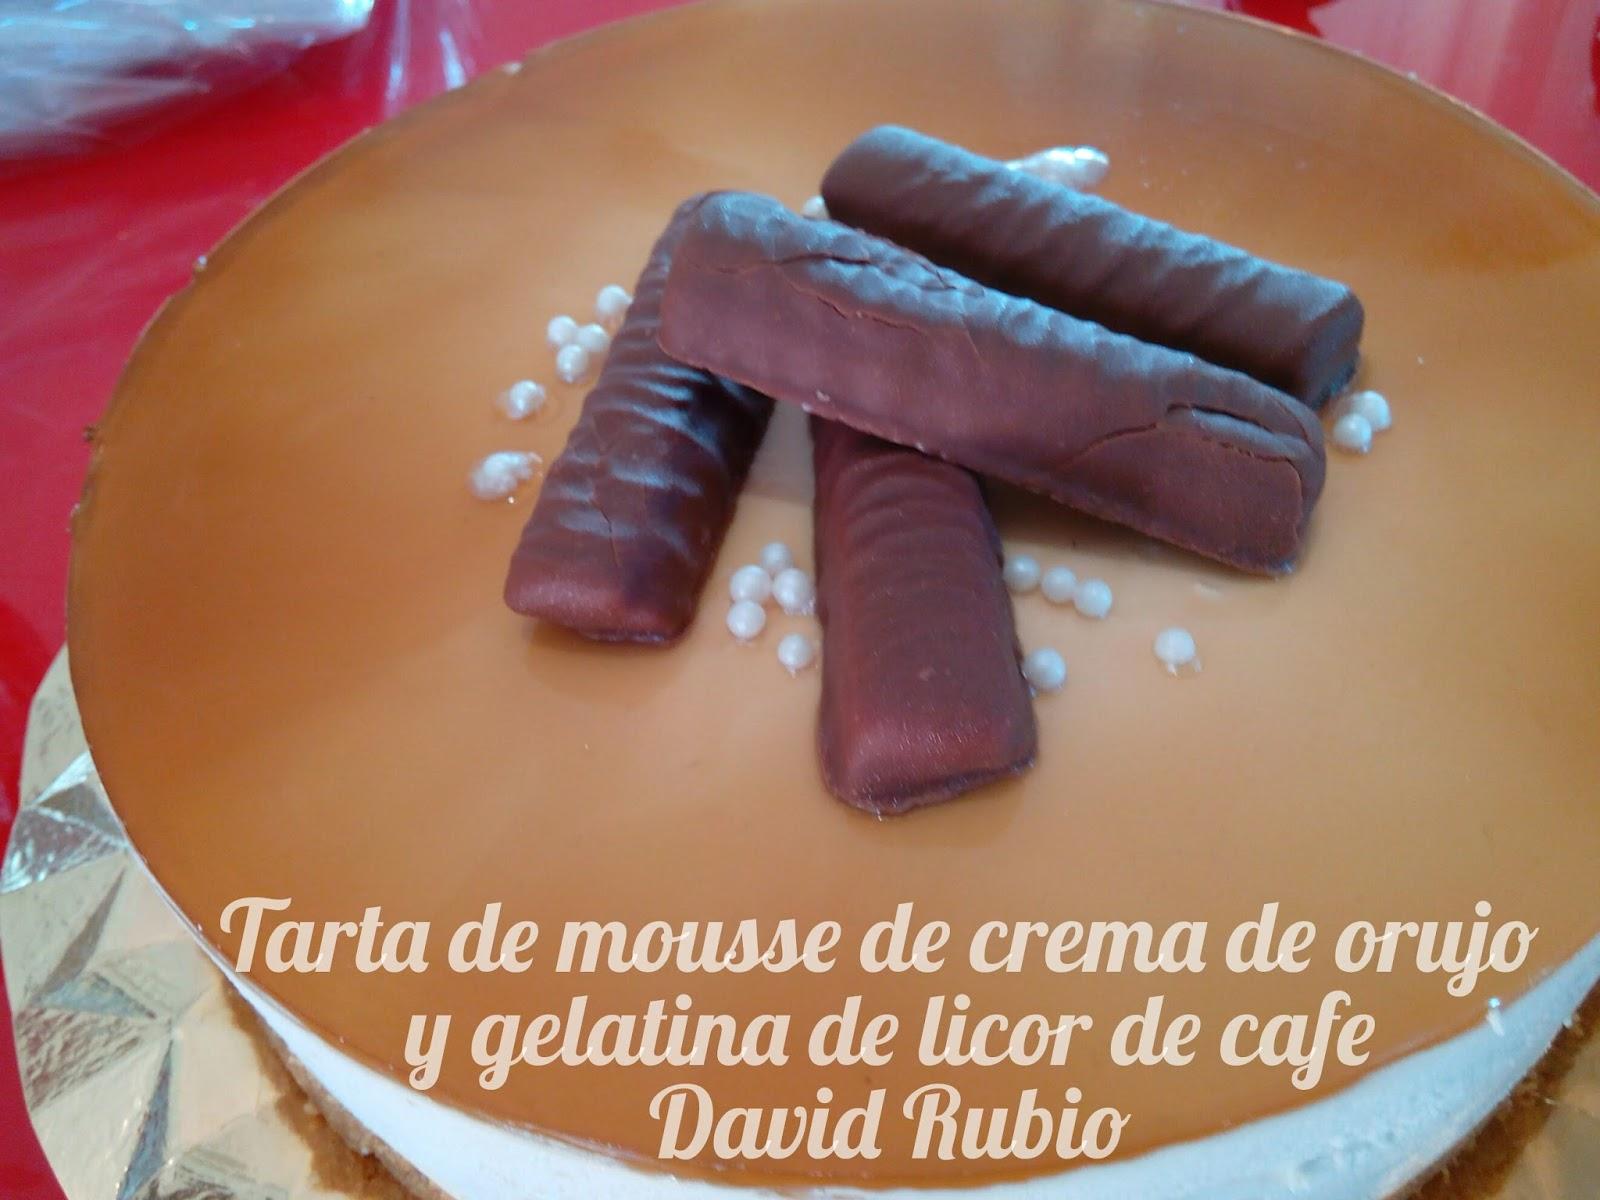 Tarta de mousse de crema de orujo y gelatina de licor de cafe